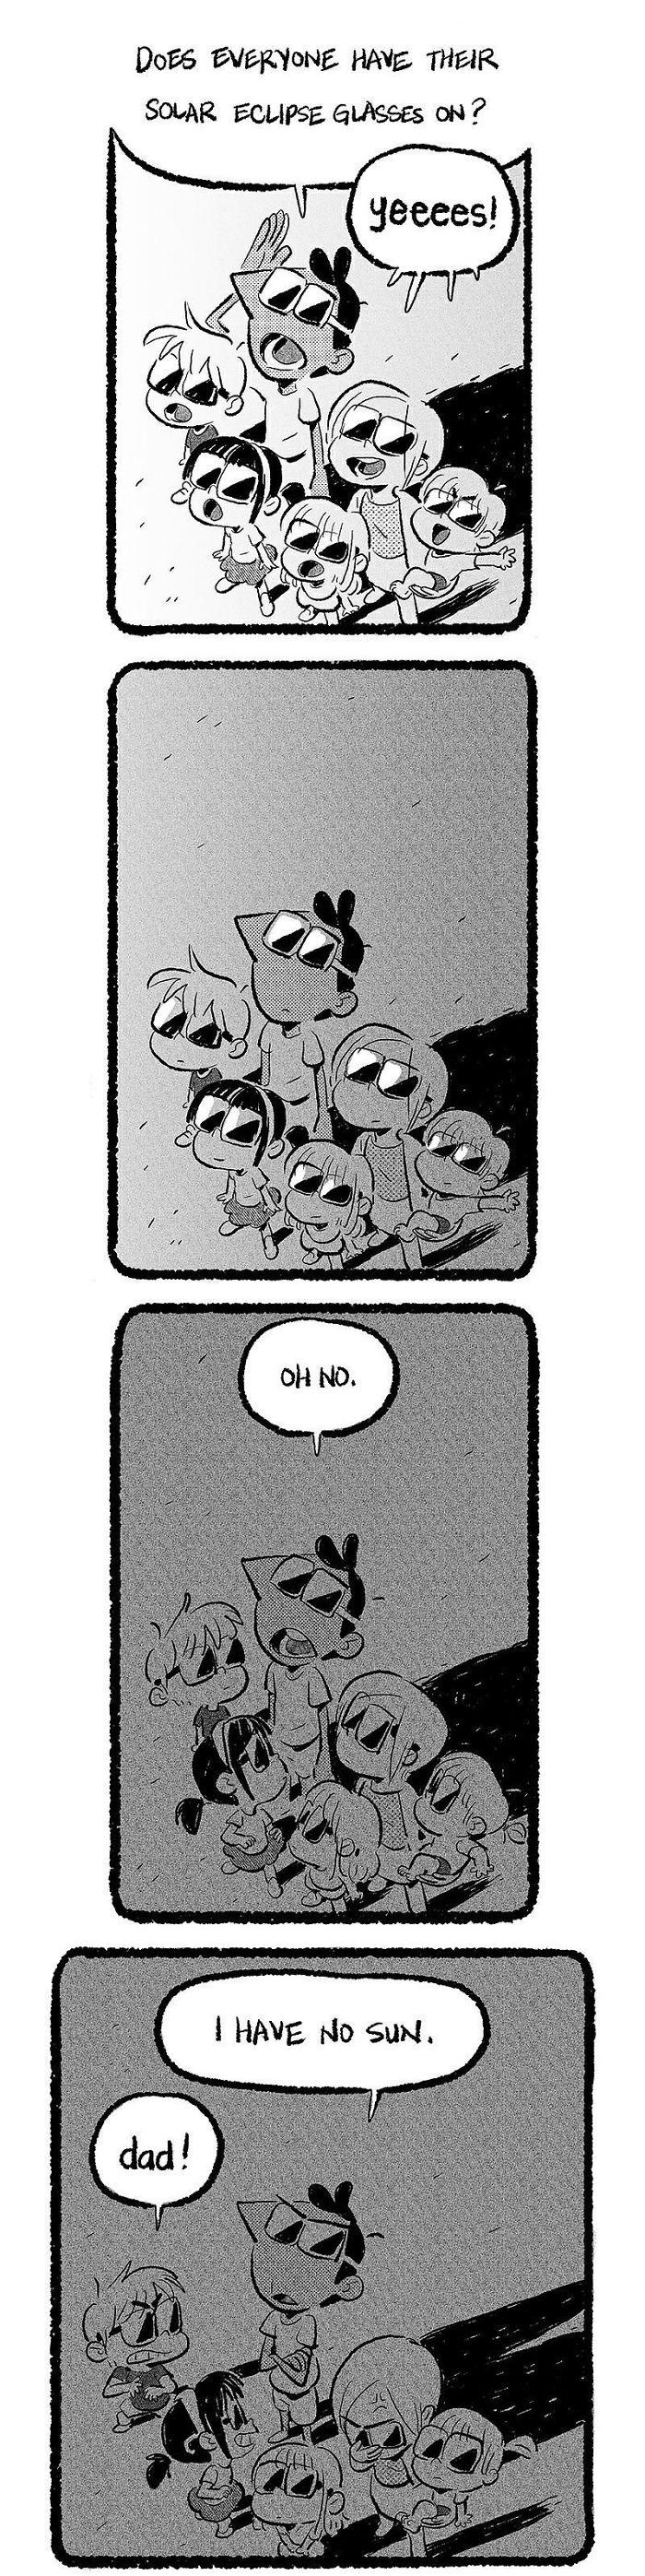 Comics-Precious-Rascals-Anthony-Holden